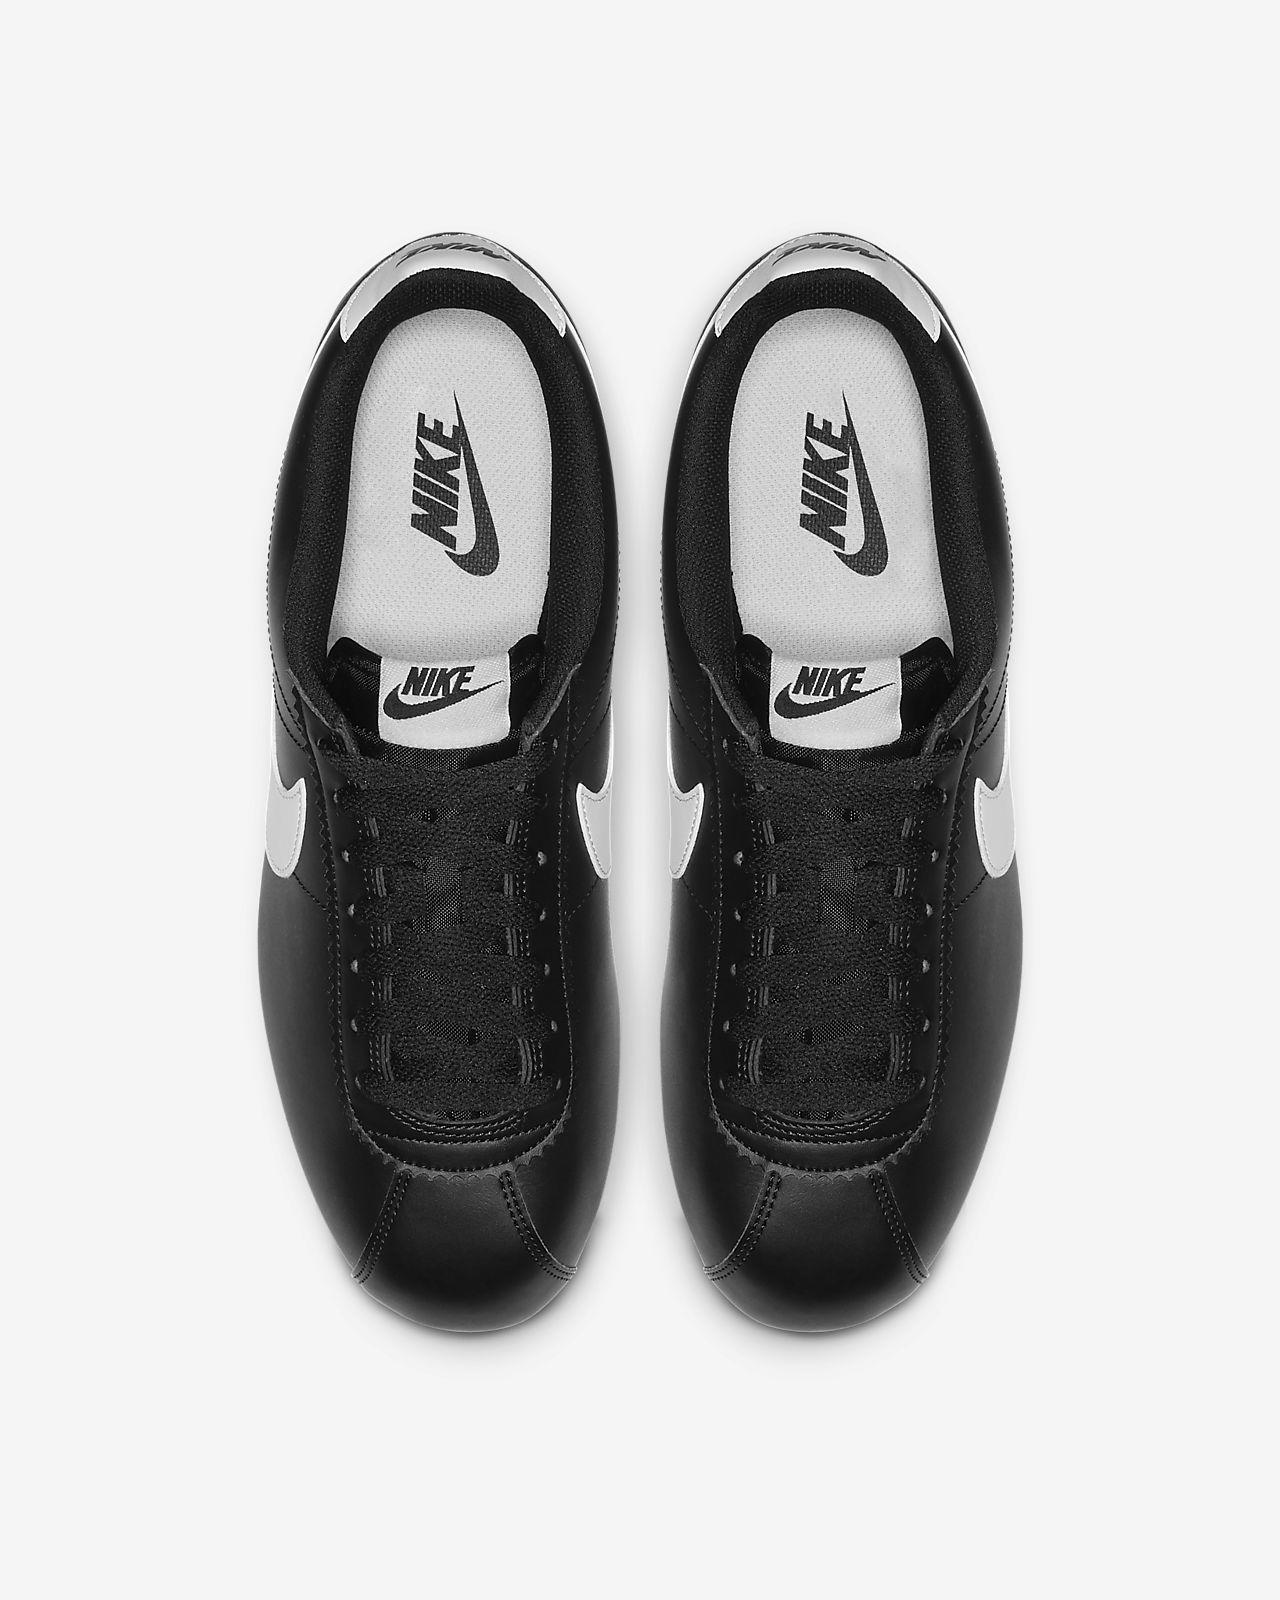 free shipping 8317e bd44b ... Chaussure Nike Classic Cortez pour Femme